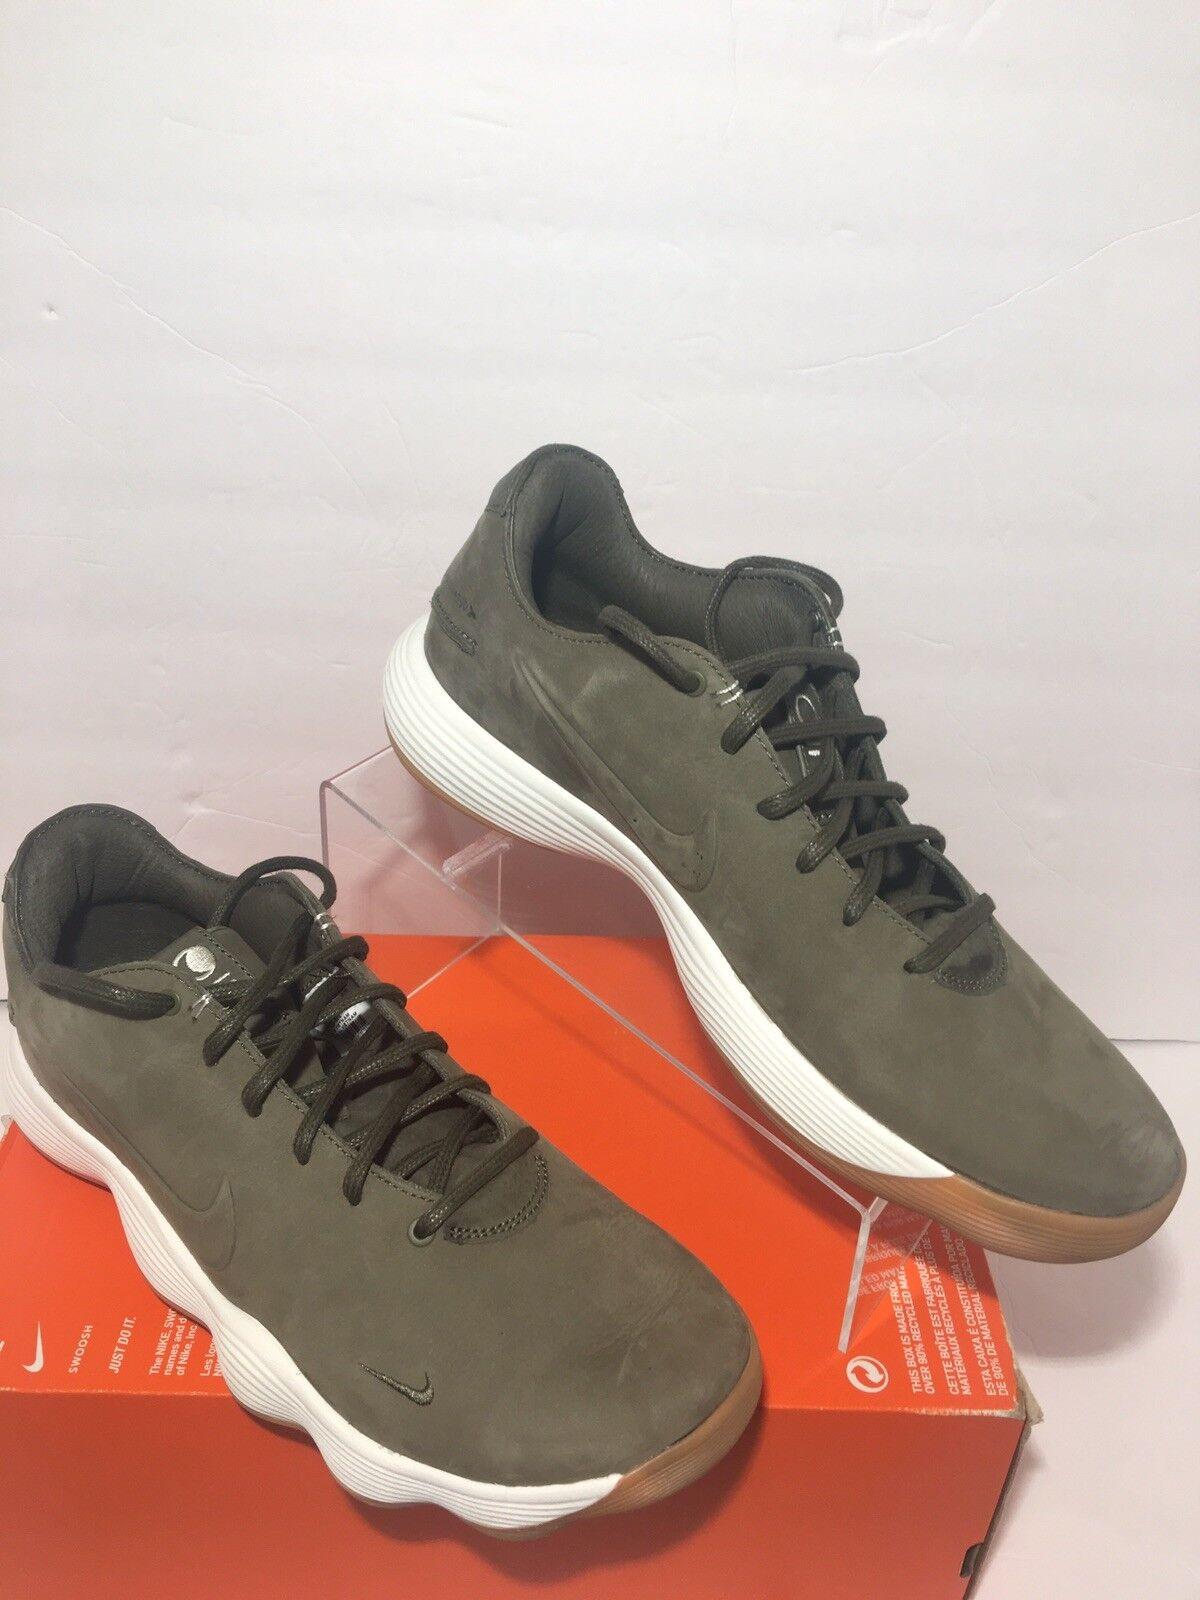 Nike Hyperdunk 2017 2017 2017 Low Limited Multi color Basketball shoes Sz 11 d10965